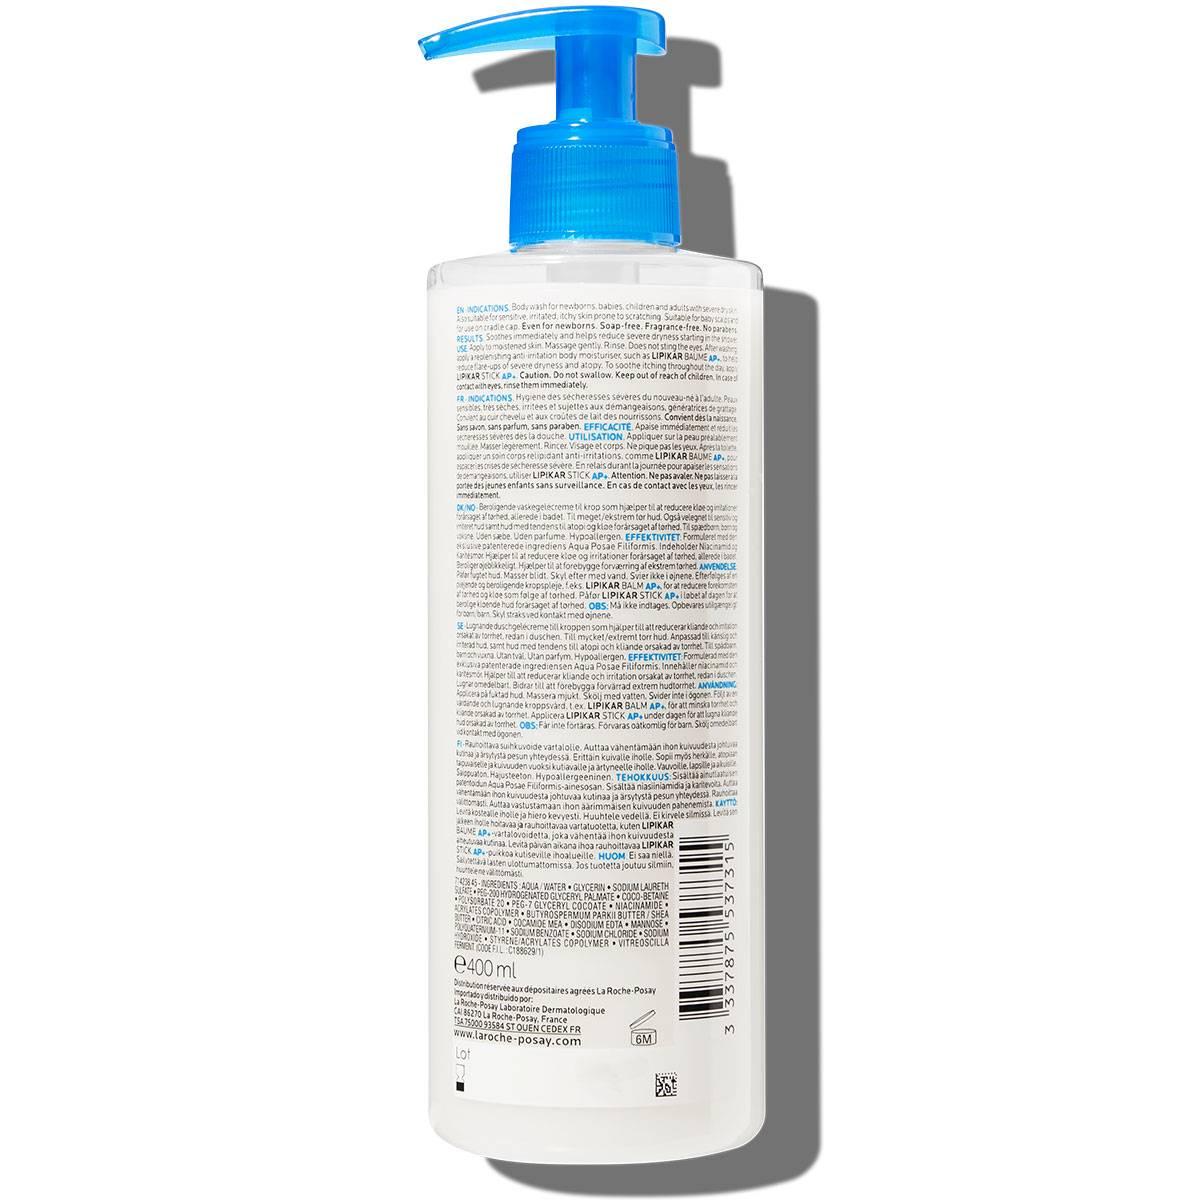 La Roche Posay ProduktSide Tendens til atopi Lipikar Syndet AP 400ml 333787553731